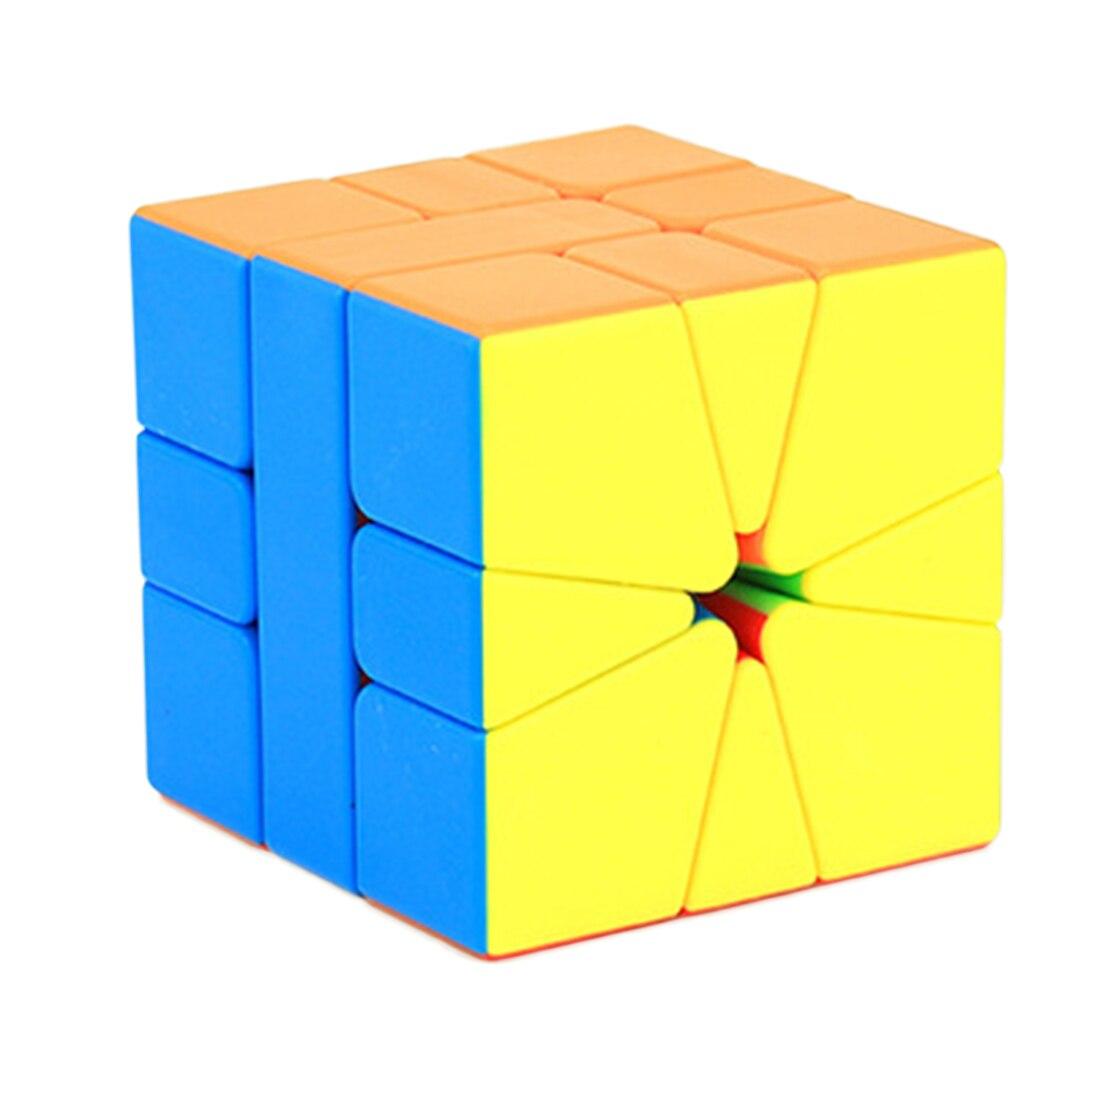 Moyu MFSQ1 SQ-1 Magic Cube Puzzl Square 1 Twisty Learning Educational Kids Toys Game Drop Shipping